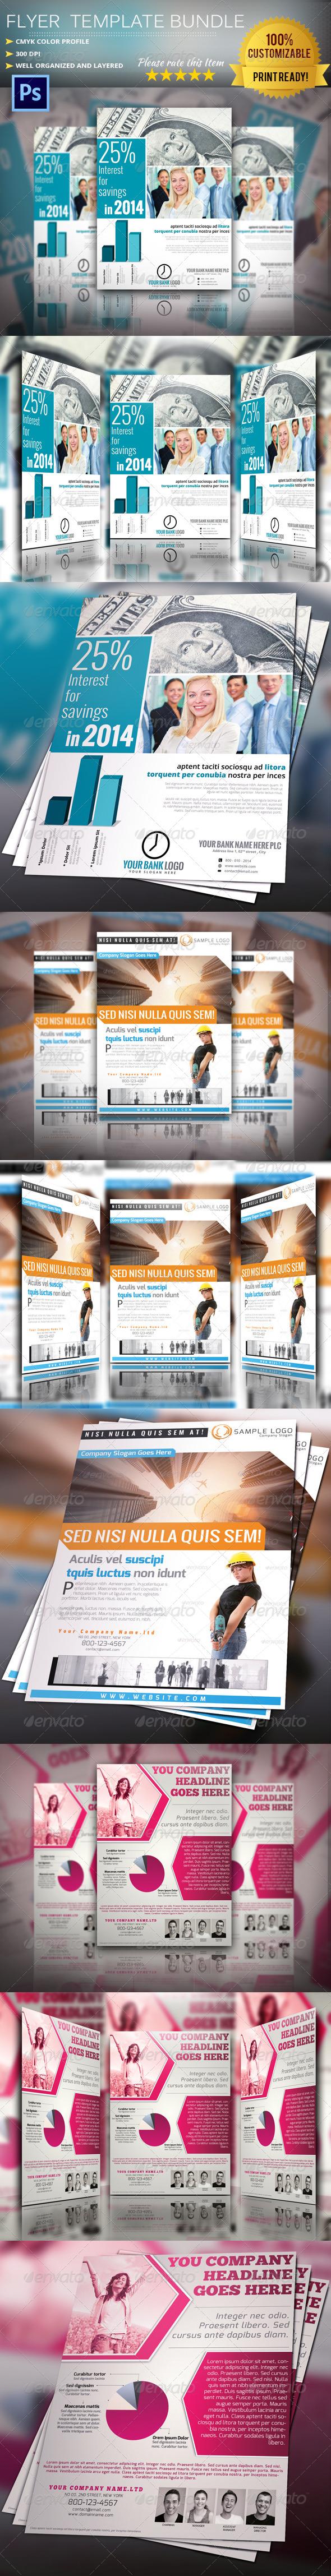 GraphicRiver Flyer Poster Bundle Vol.4 5872362